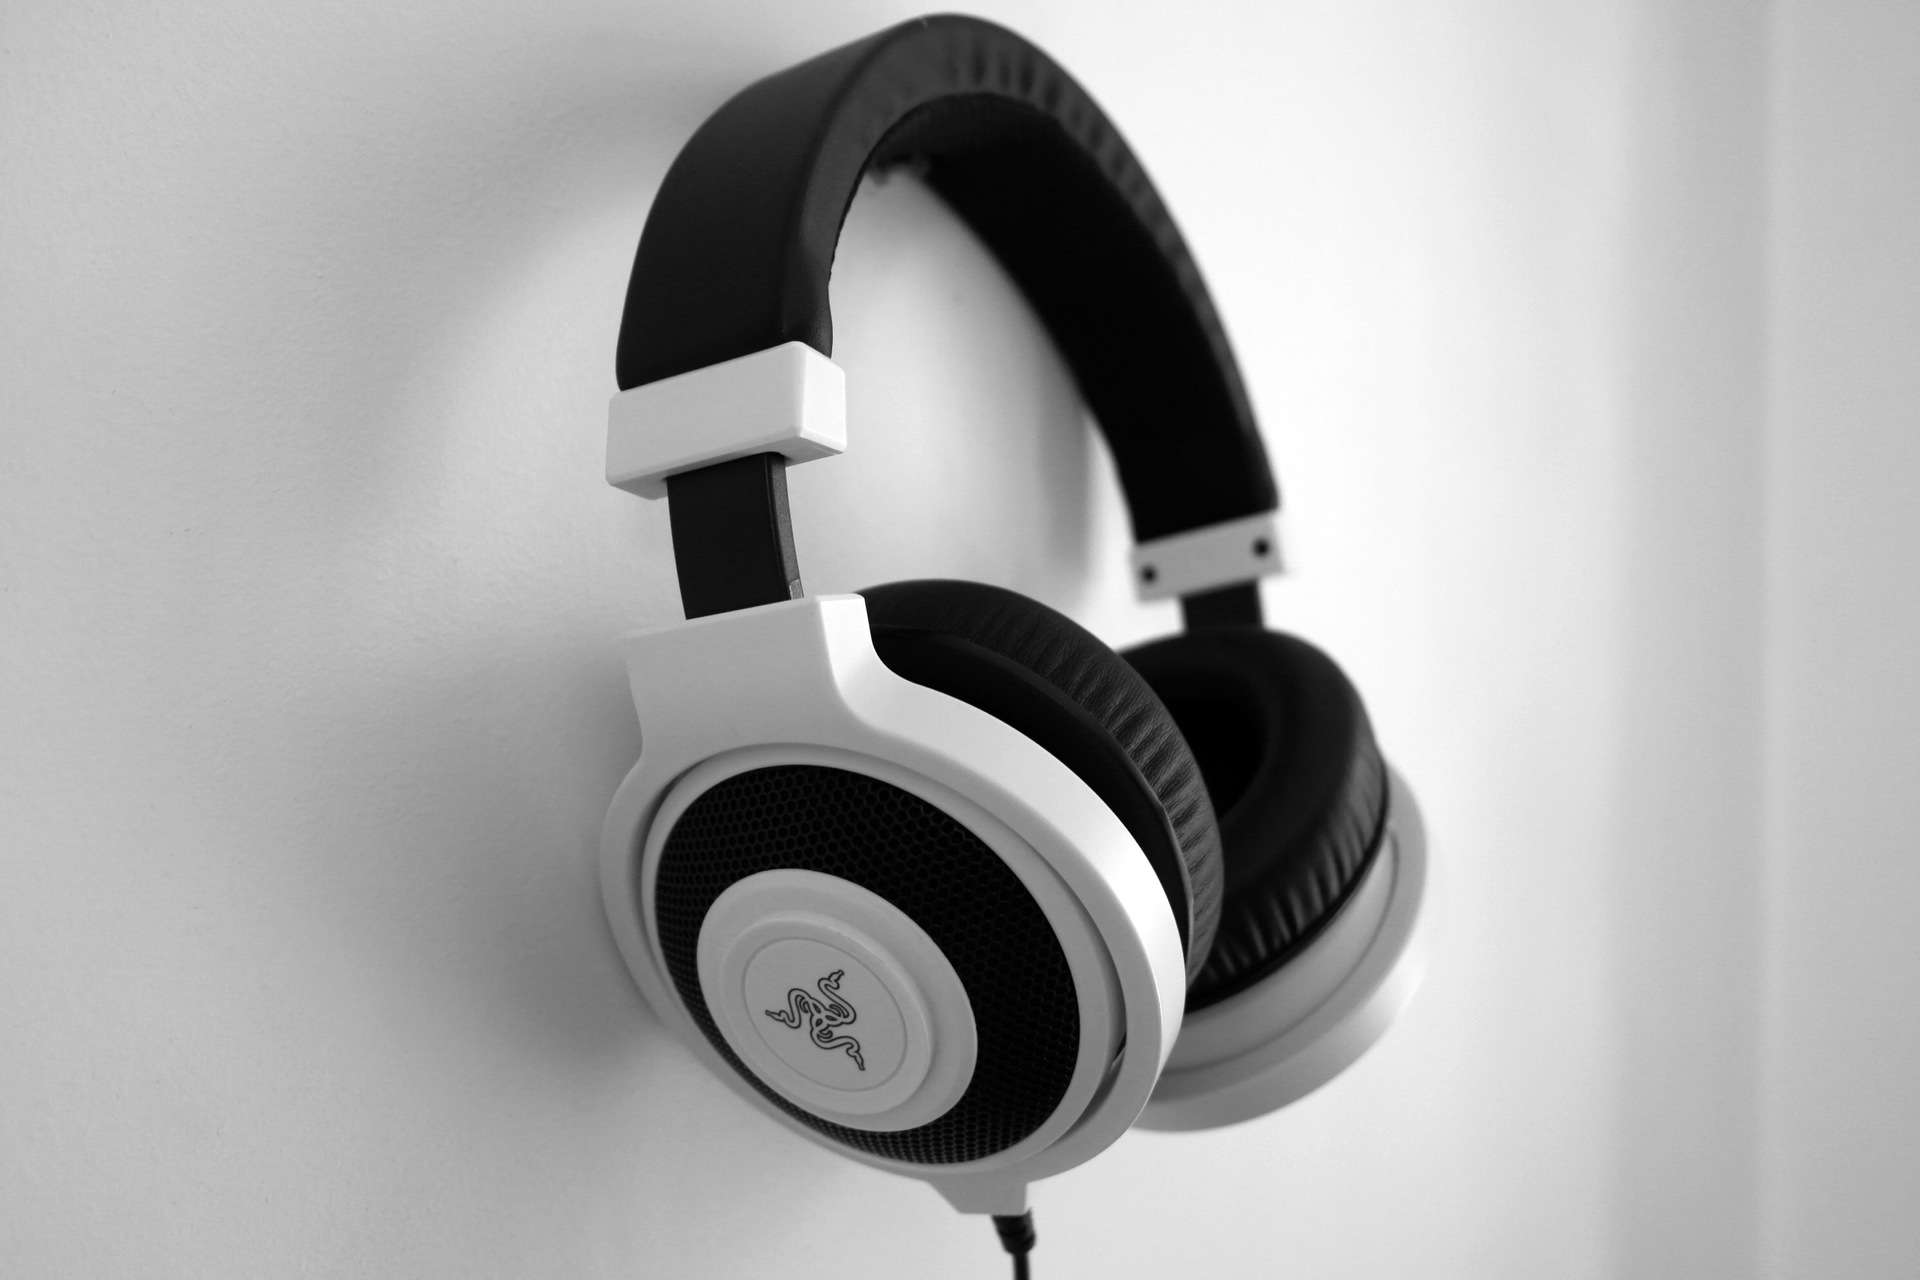 Best cheap headphone india